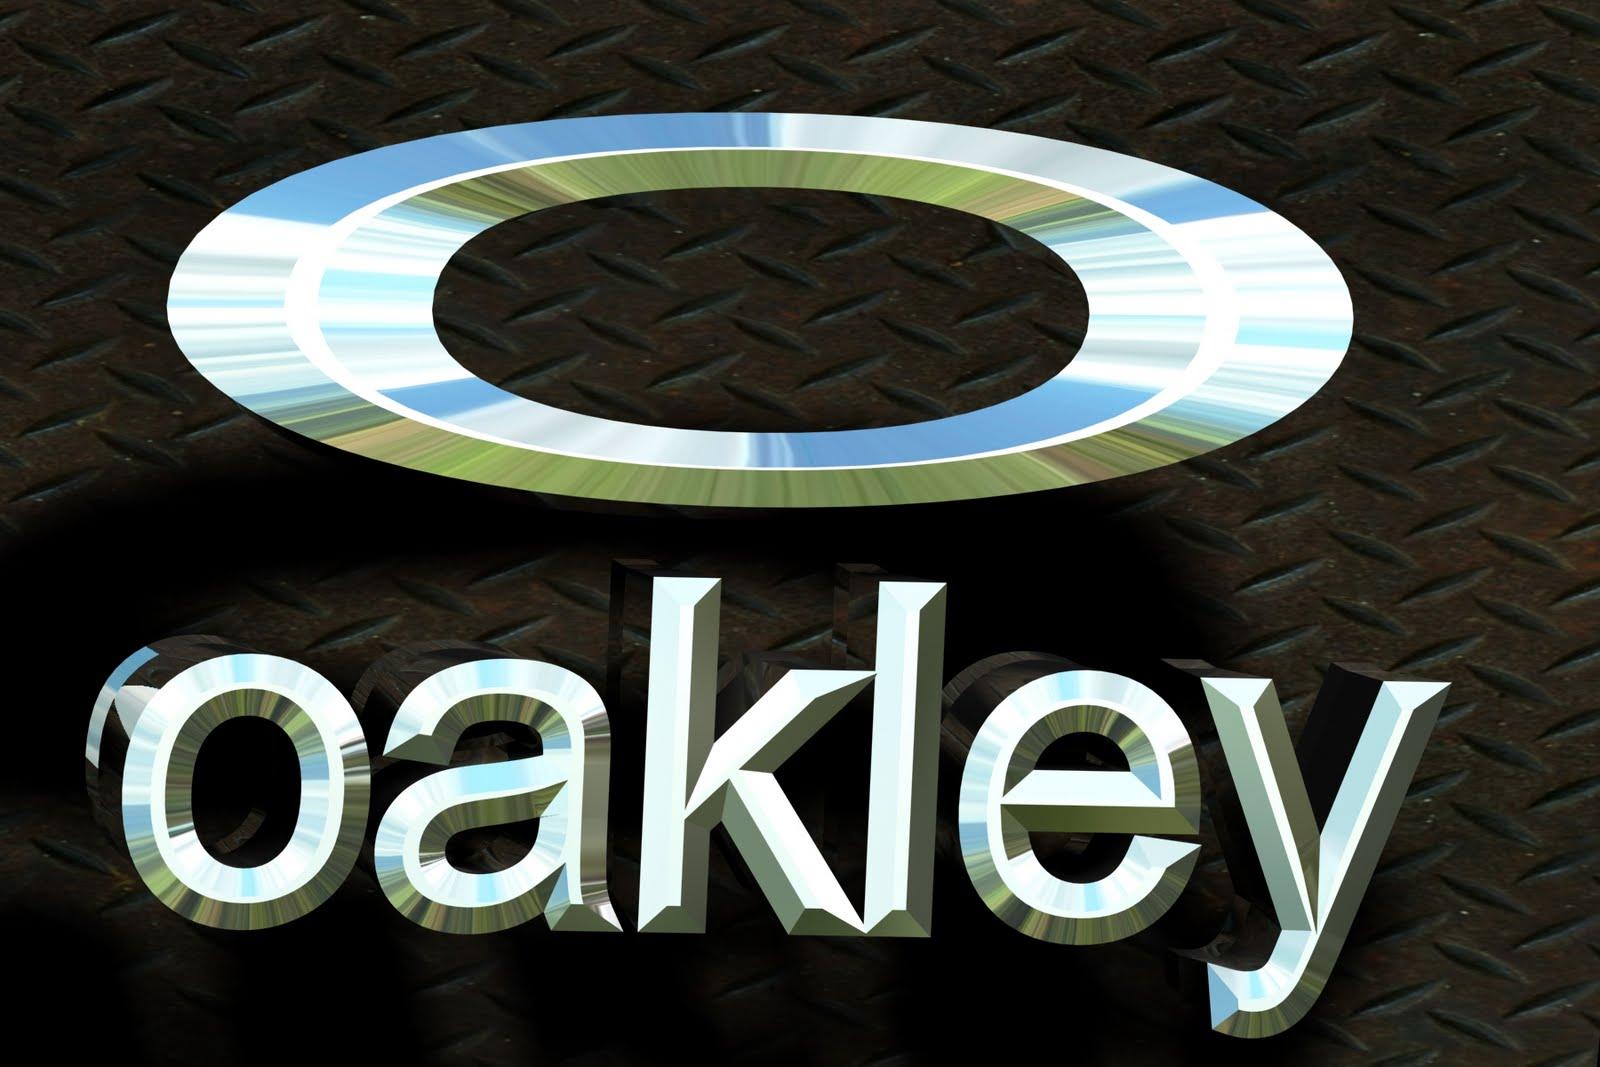 oakley symbol 0o1b  Oakley Images